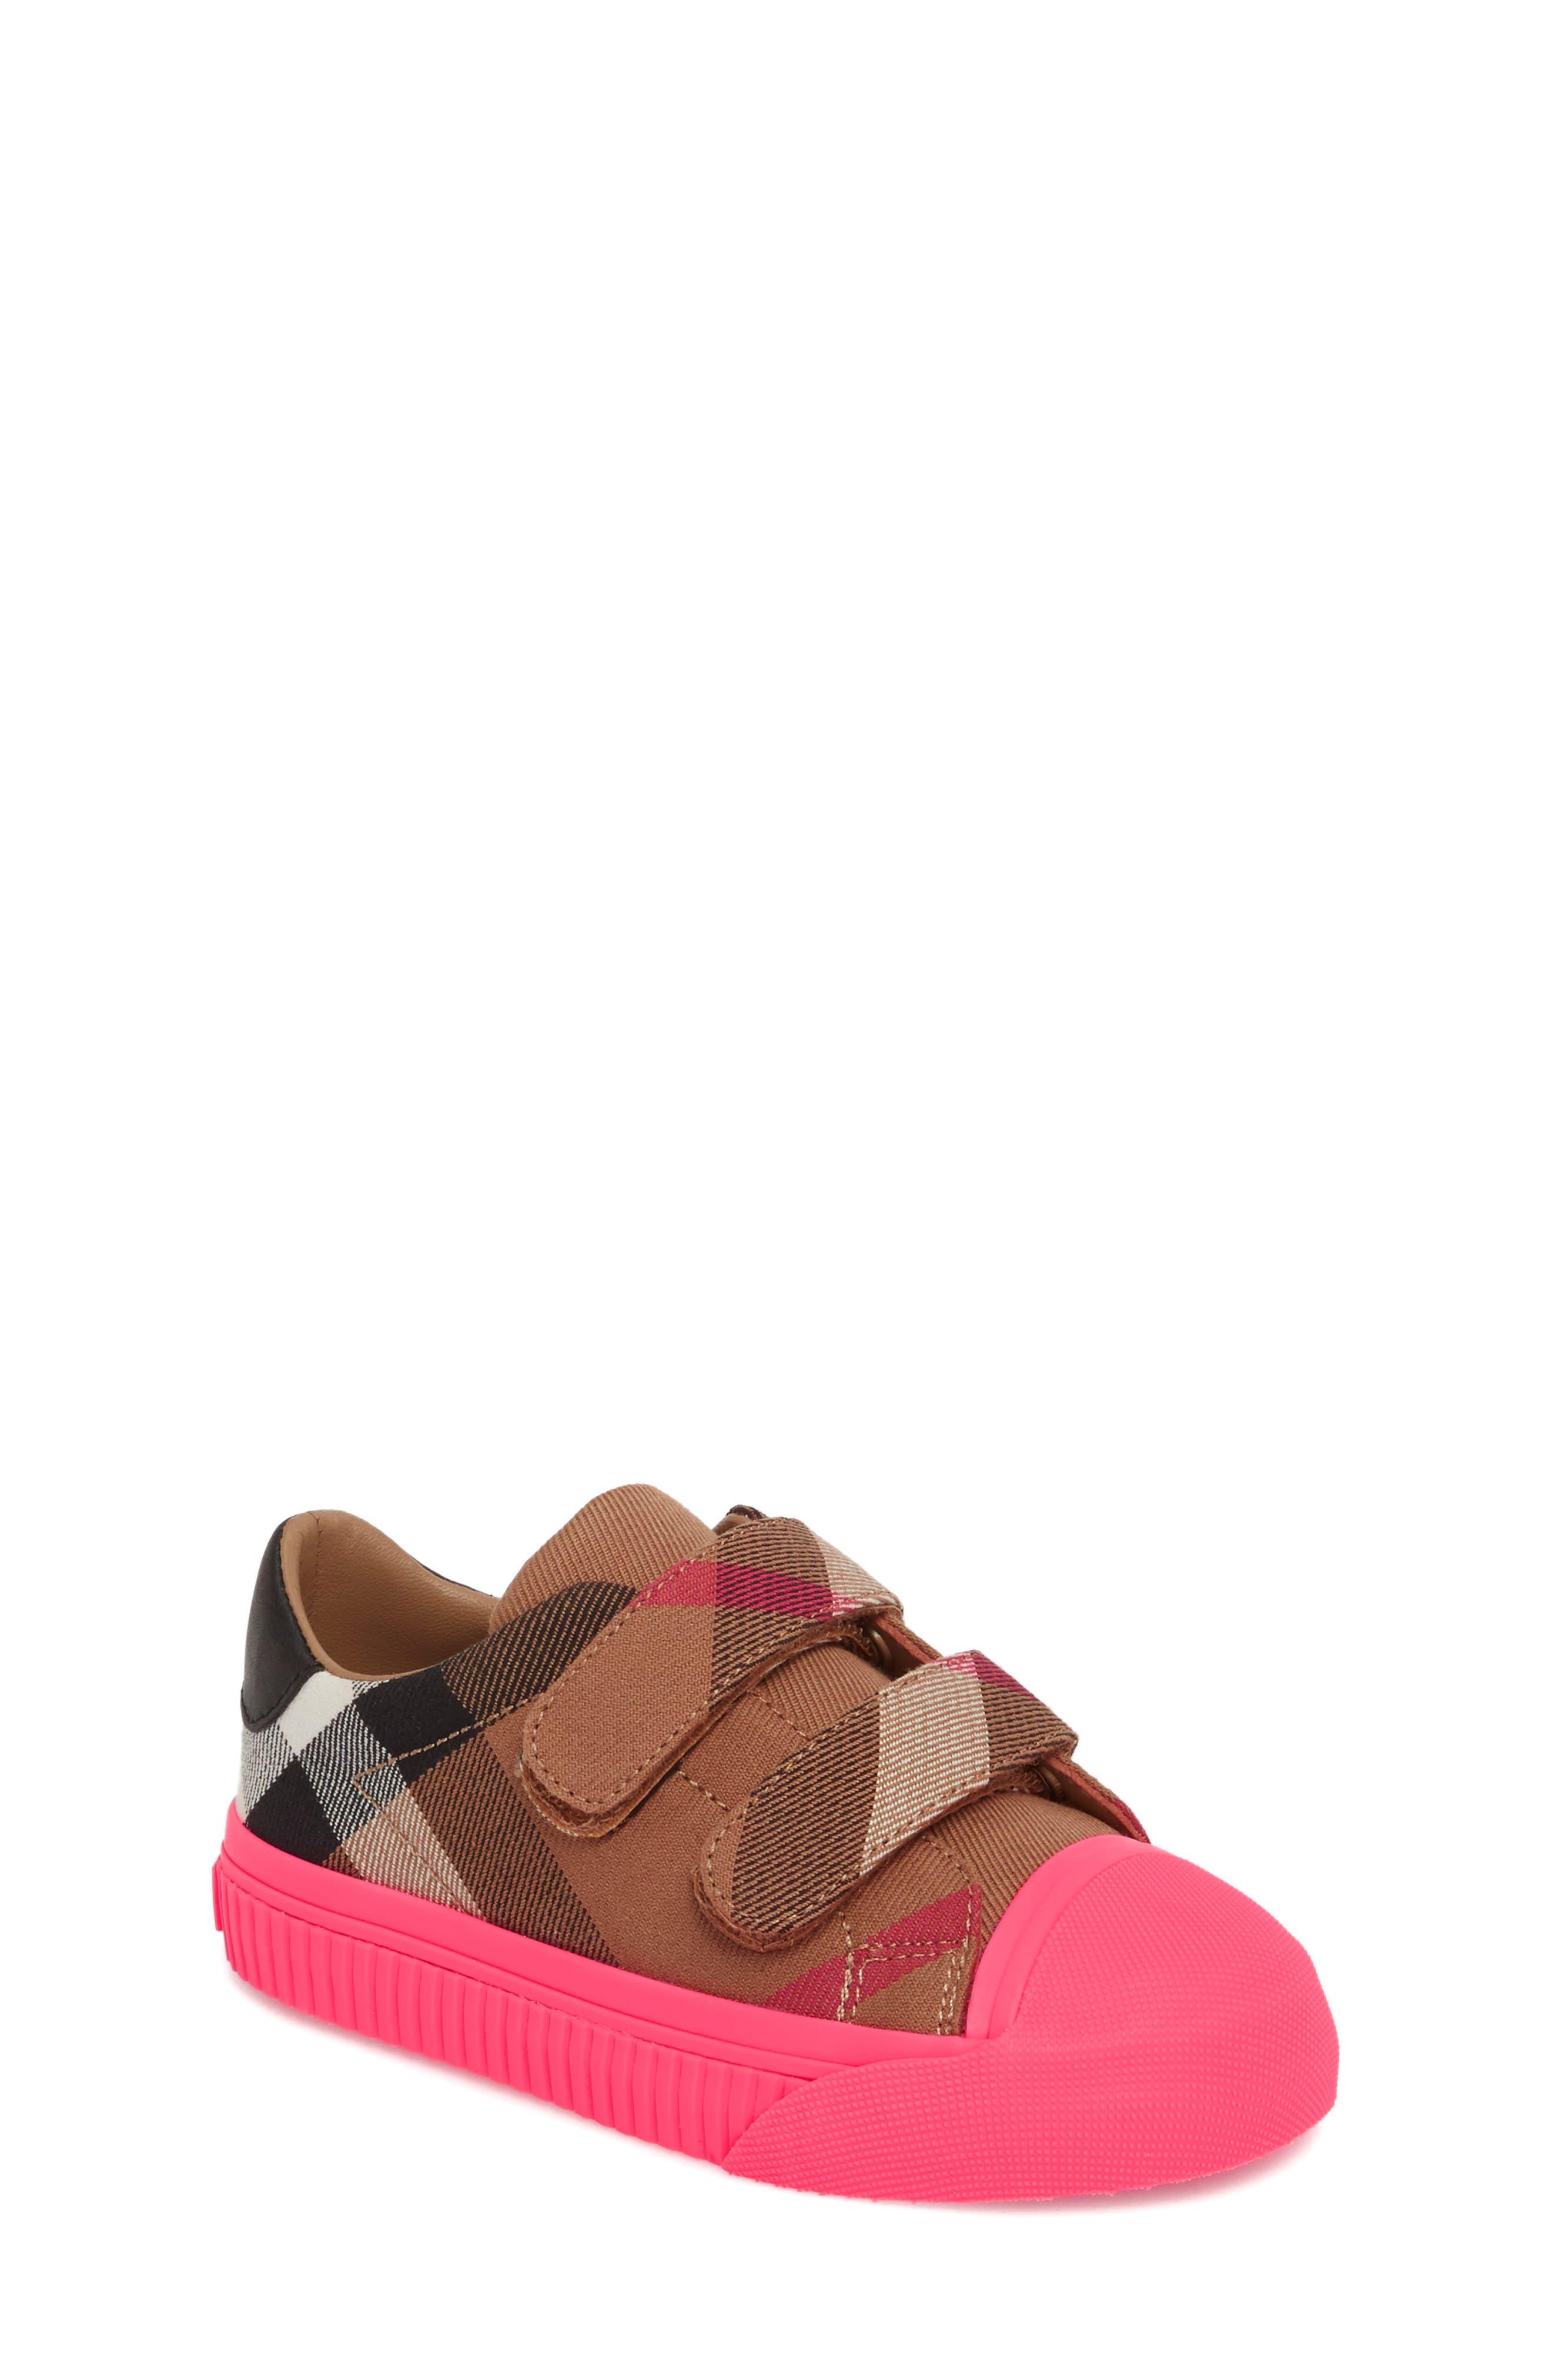 Belside Sneaker,                         Main,                         color, Classic/ Neon Pink